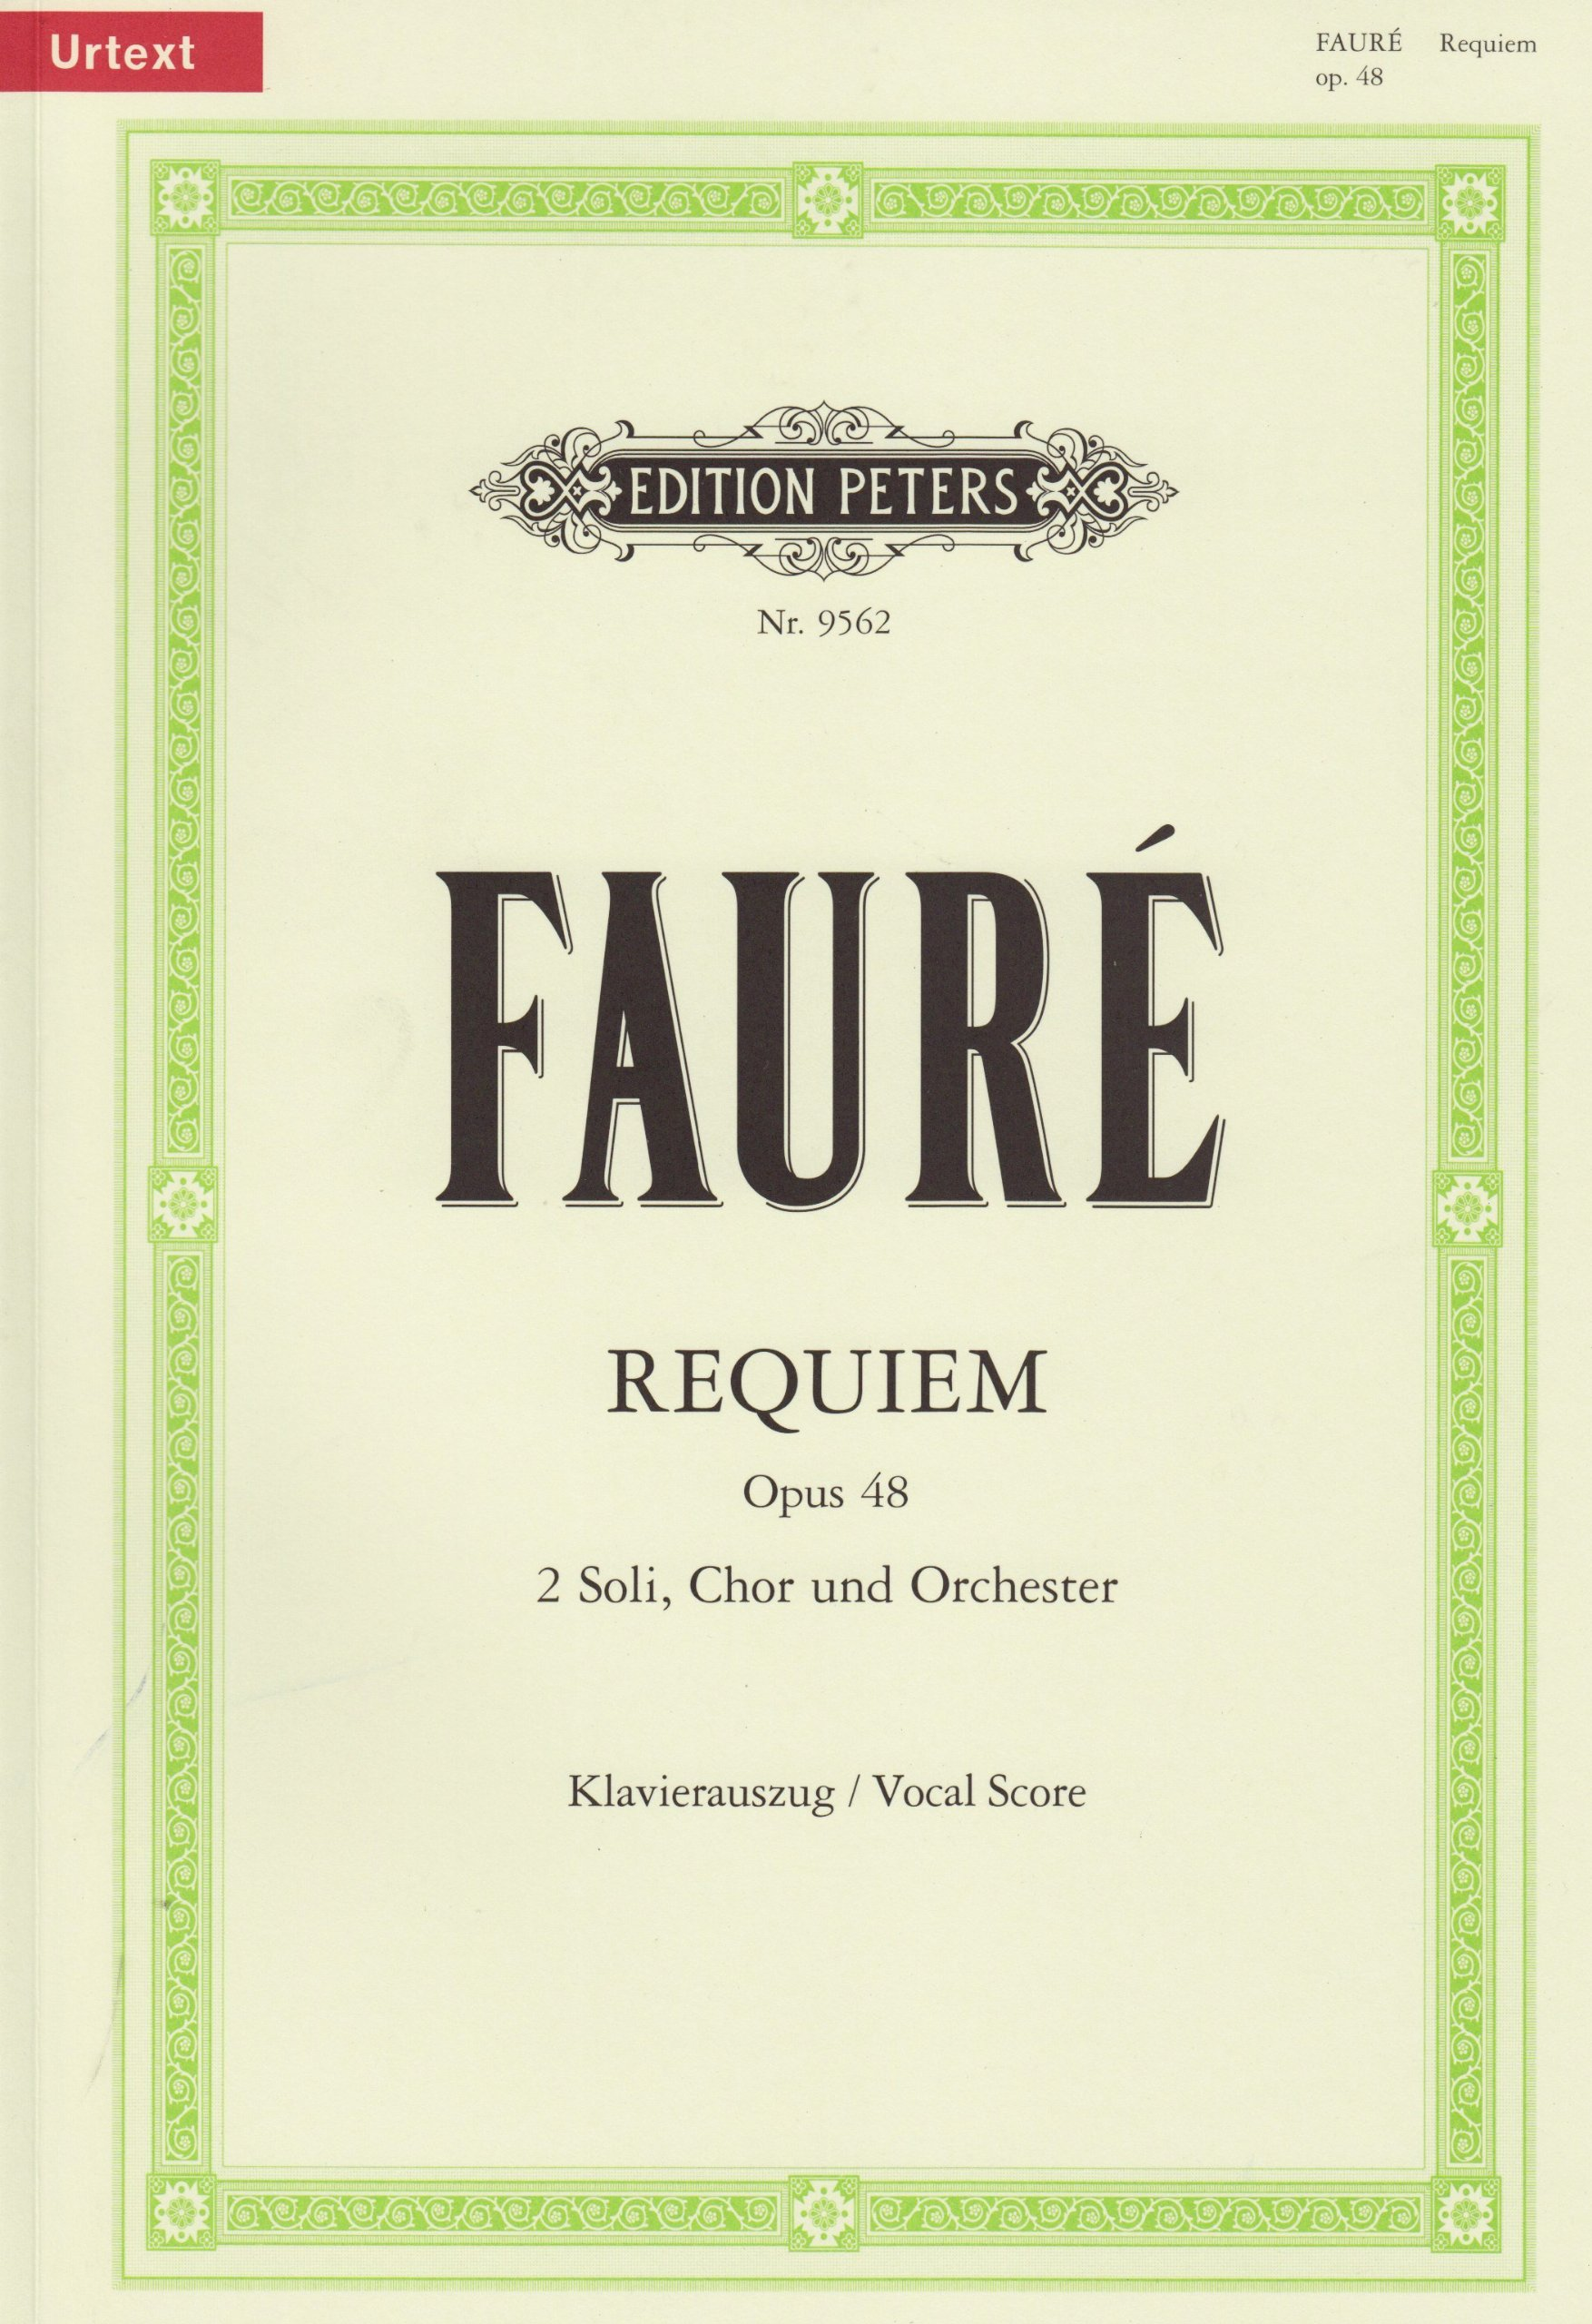 Messe de Requiem d-Moll op. 48: für Soli (Sopran- und Bariton-Solo), Chor und Orchester / Klavierauszug